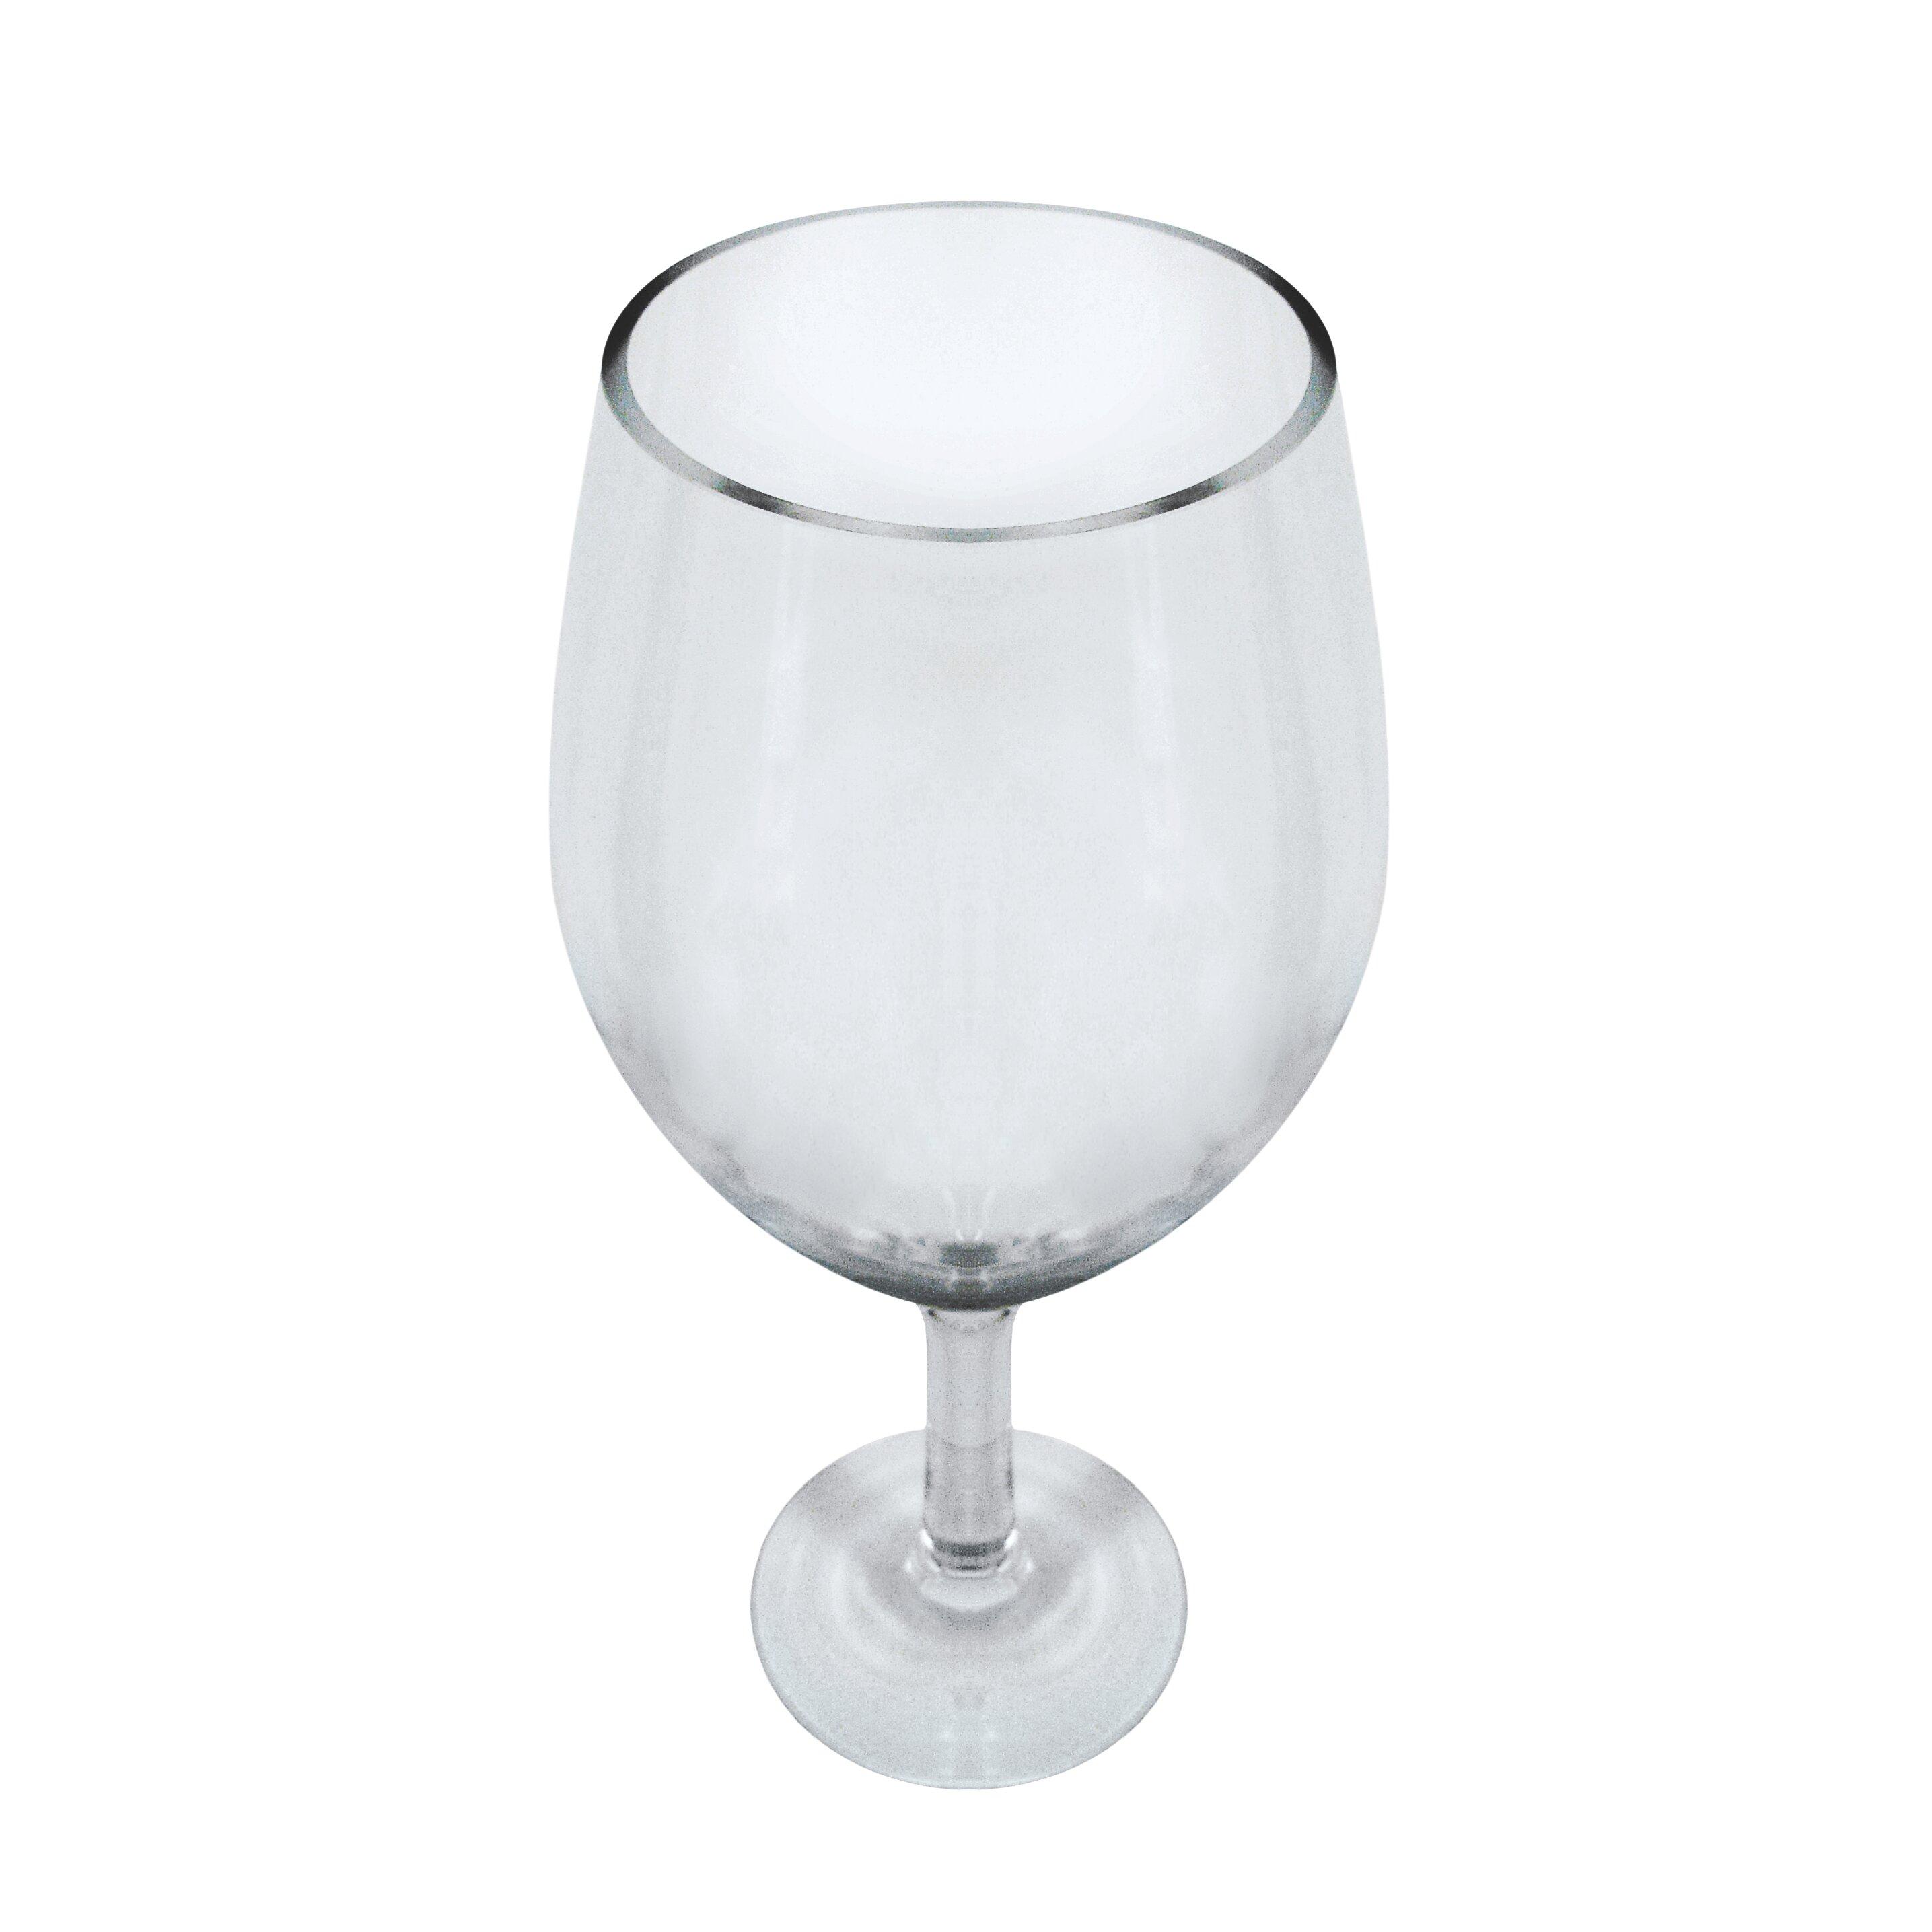 Epicureanist Large Decorative Wine Glass Wayfair